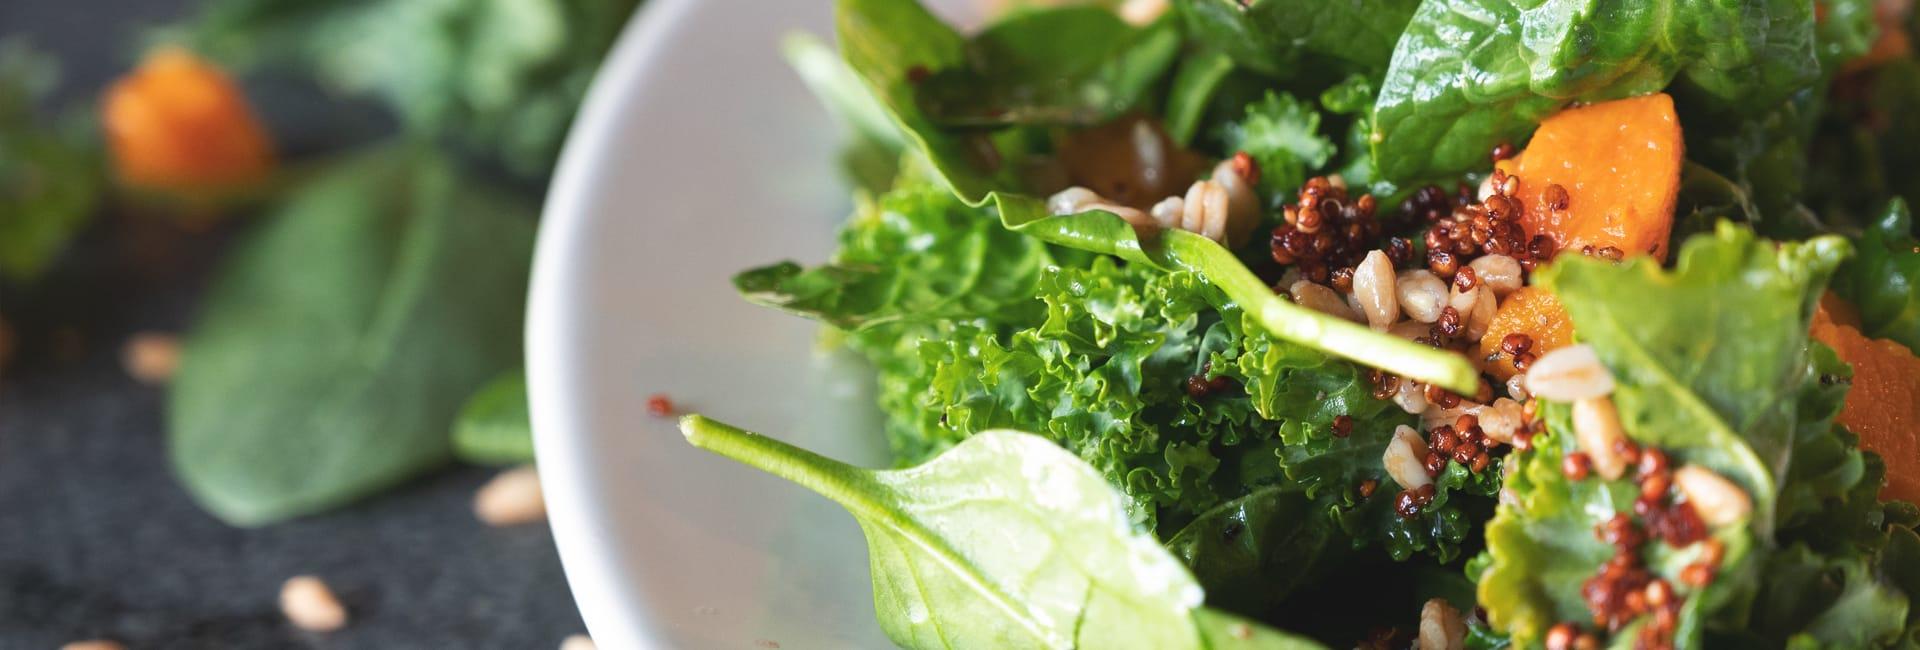 Clyde Iron Works fresh salads